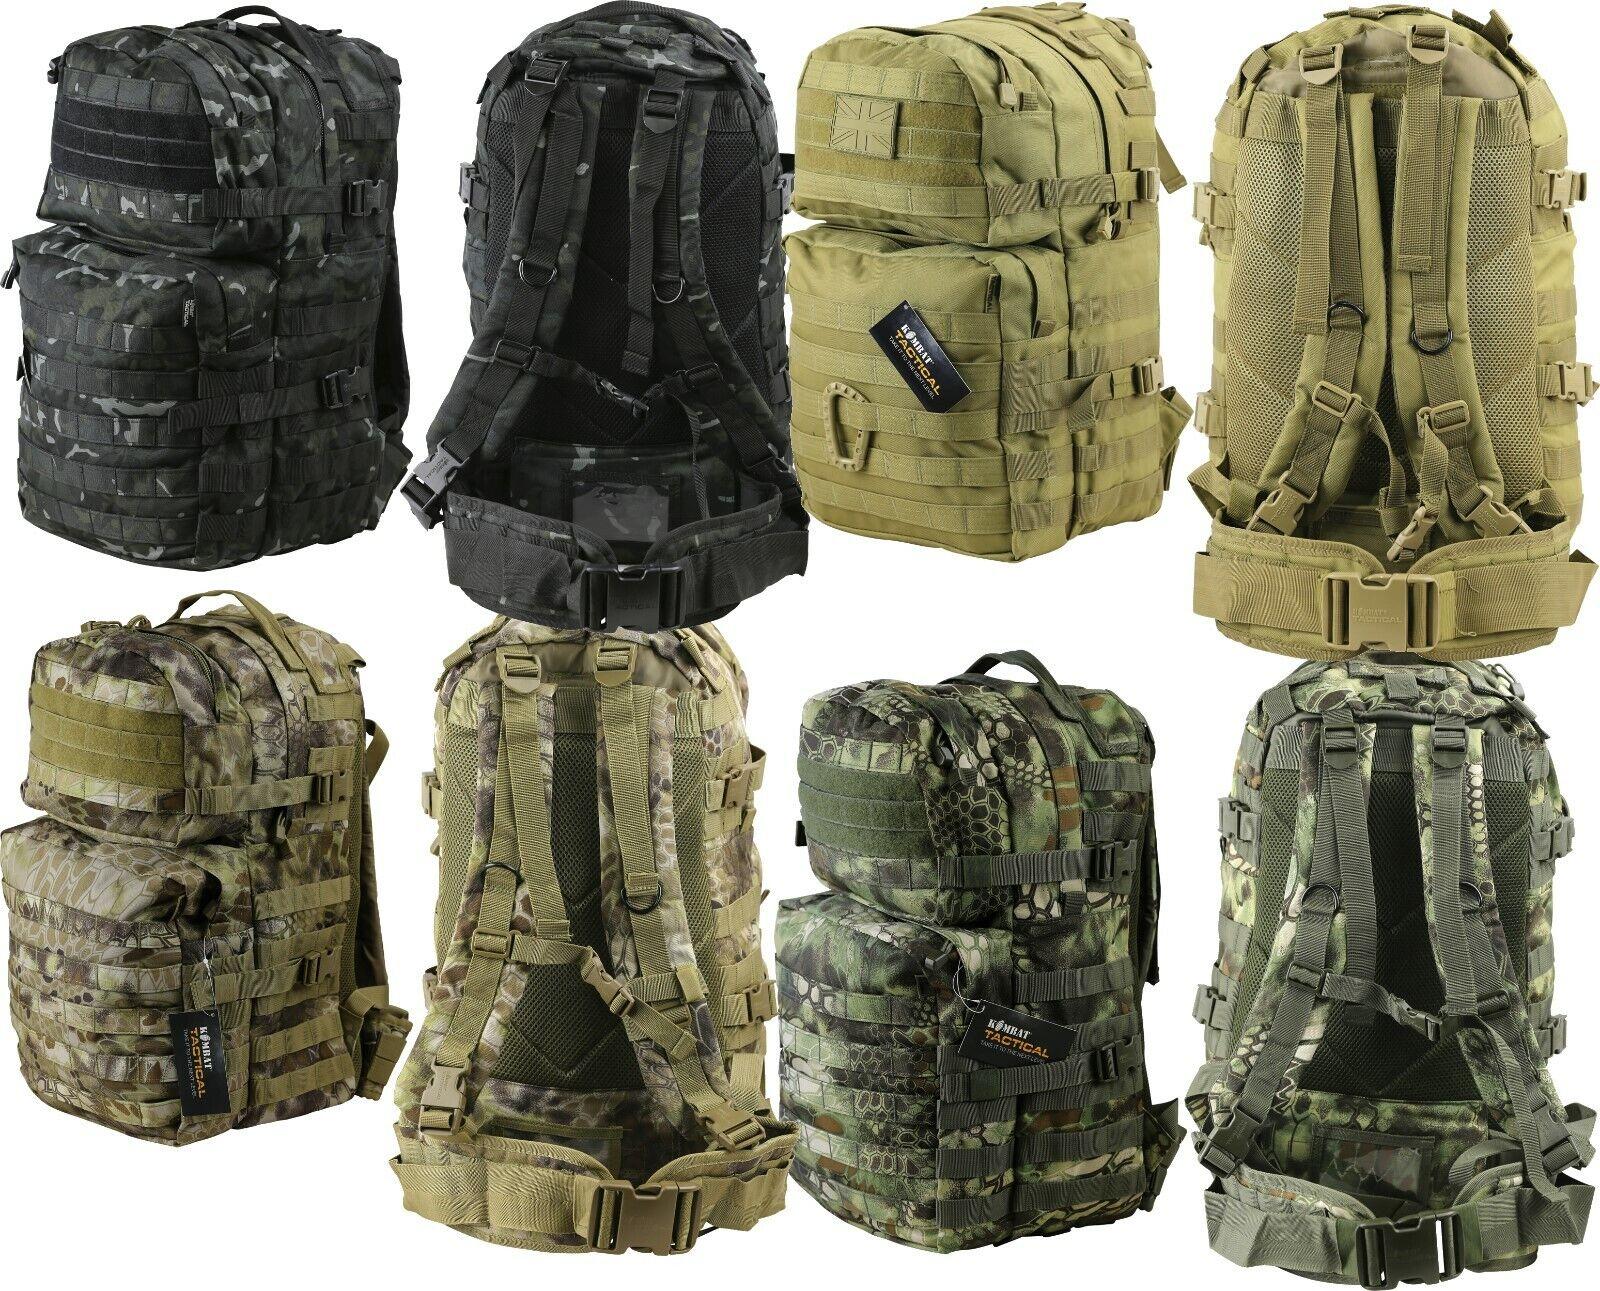 KOMBAT Medio MOLLE assalto pack 40 LITRO Cadetto Esercito Zaino tattico da montagna